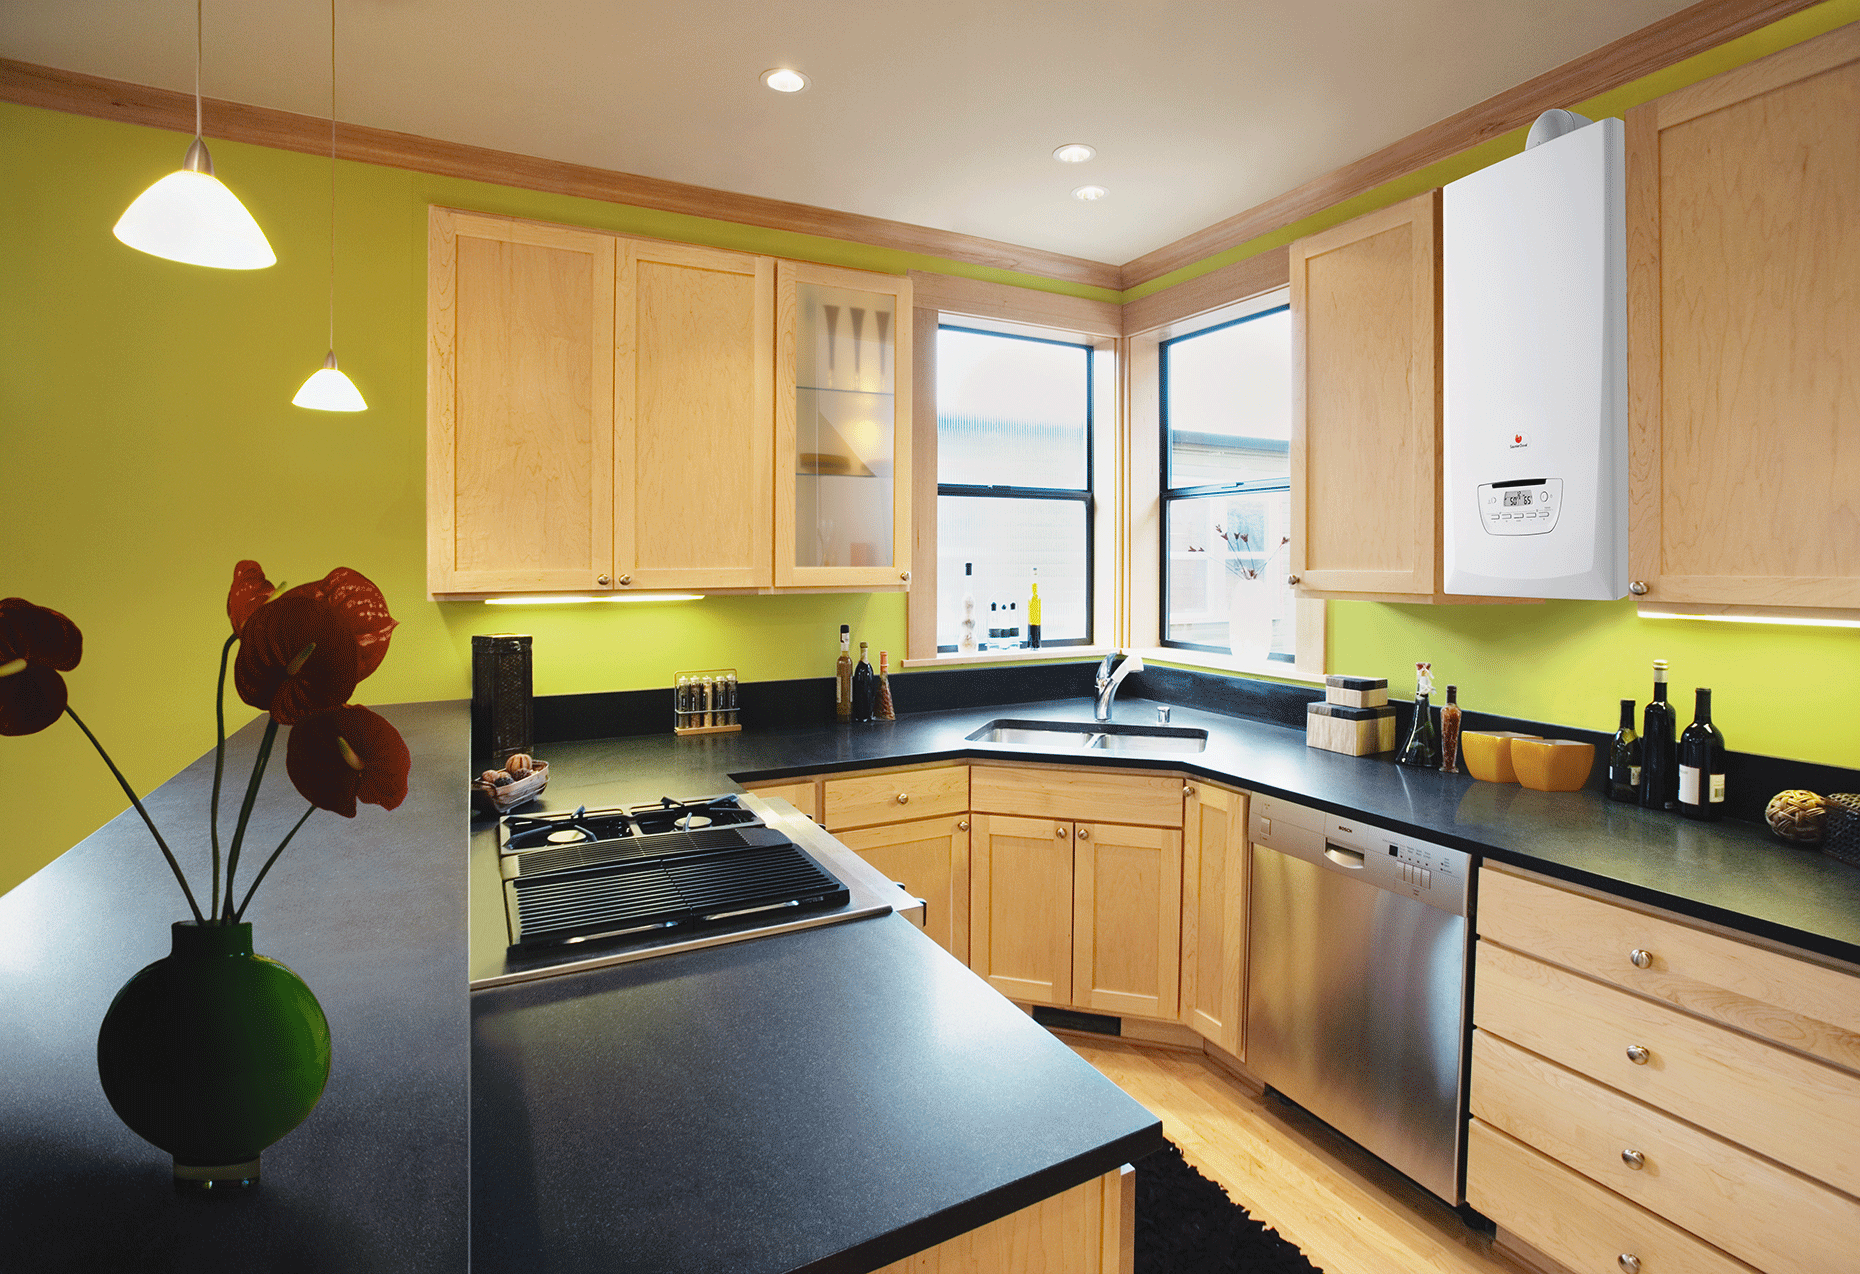 thema as condens chaudieres gaz condensation pros. Black Bedroom Furniture Sets. Home Design Ideas